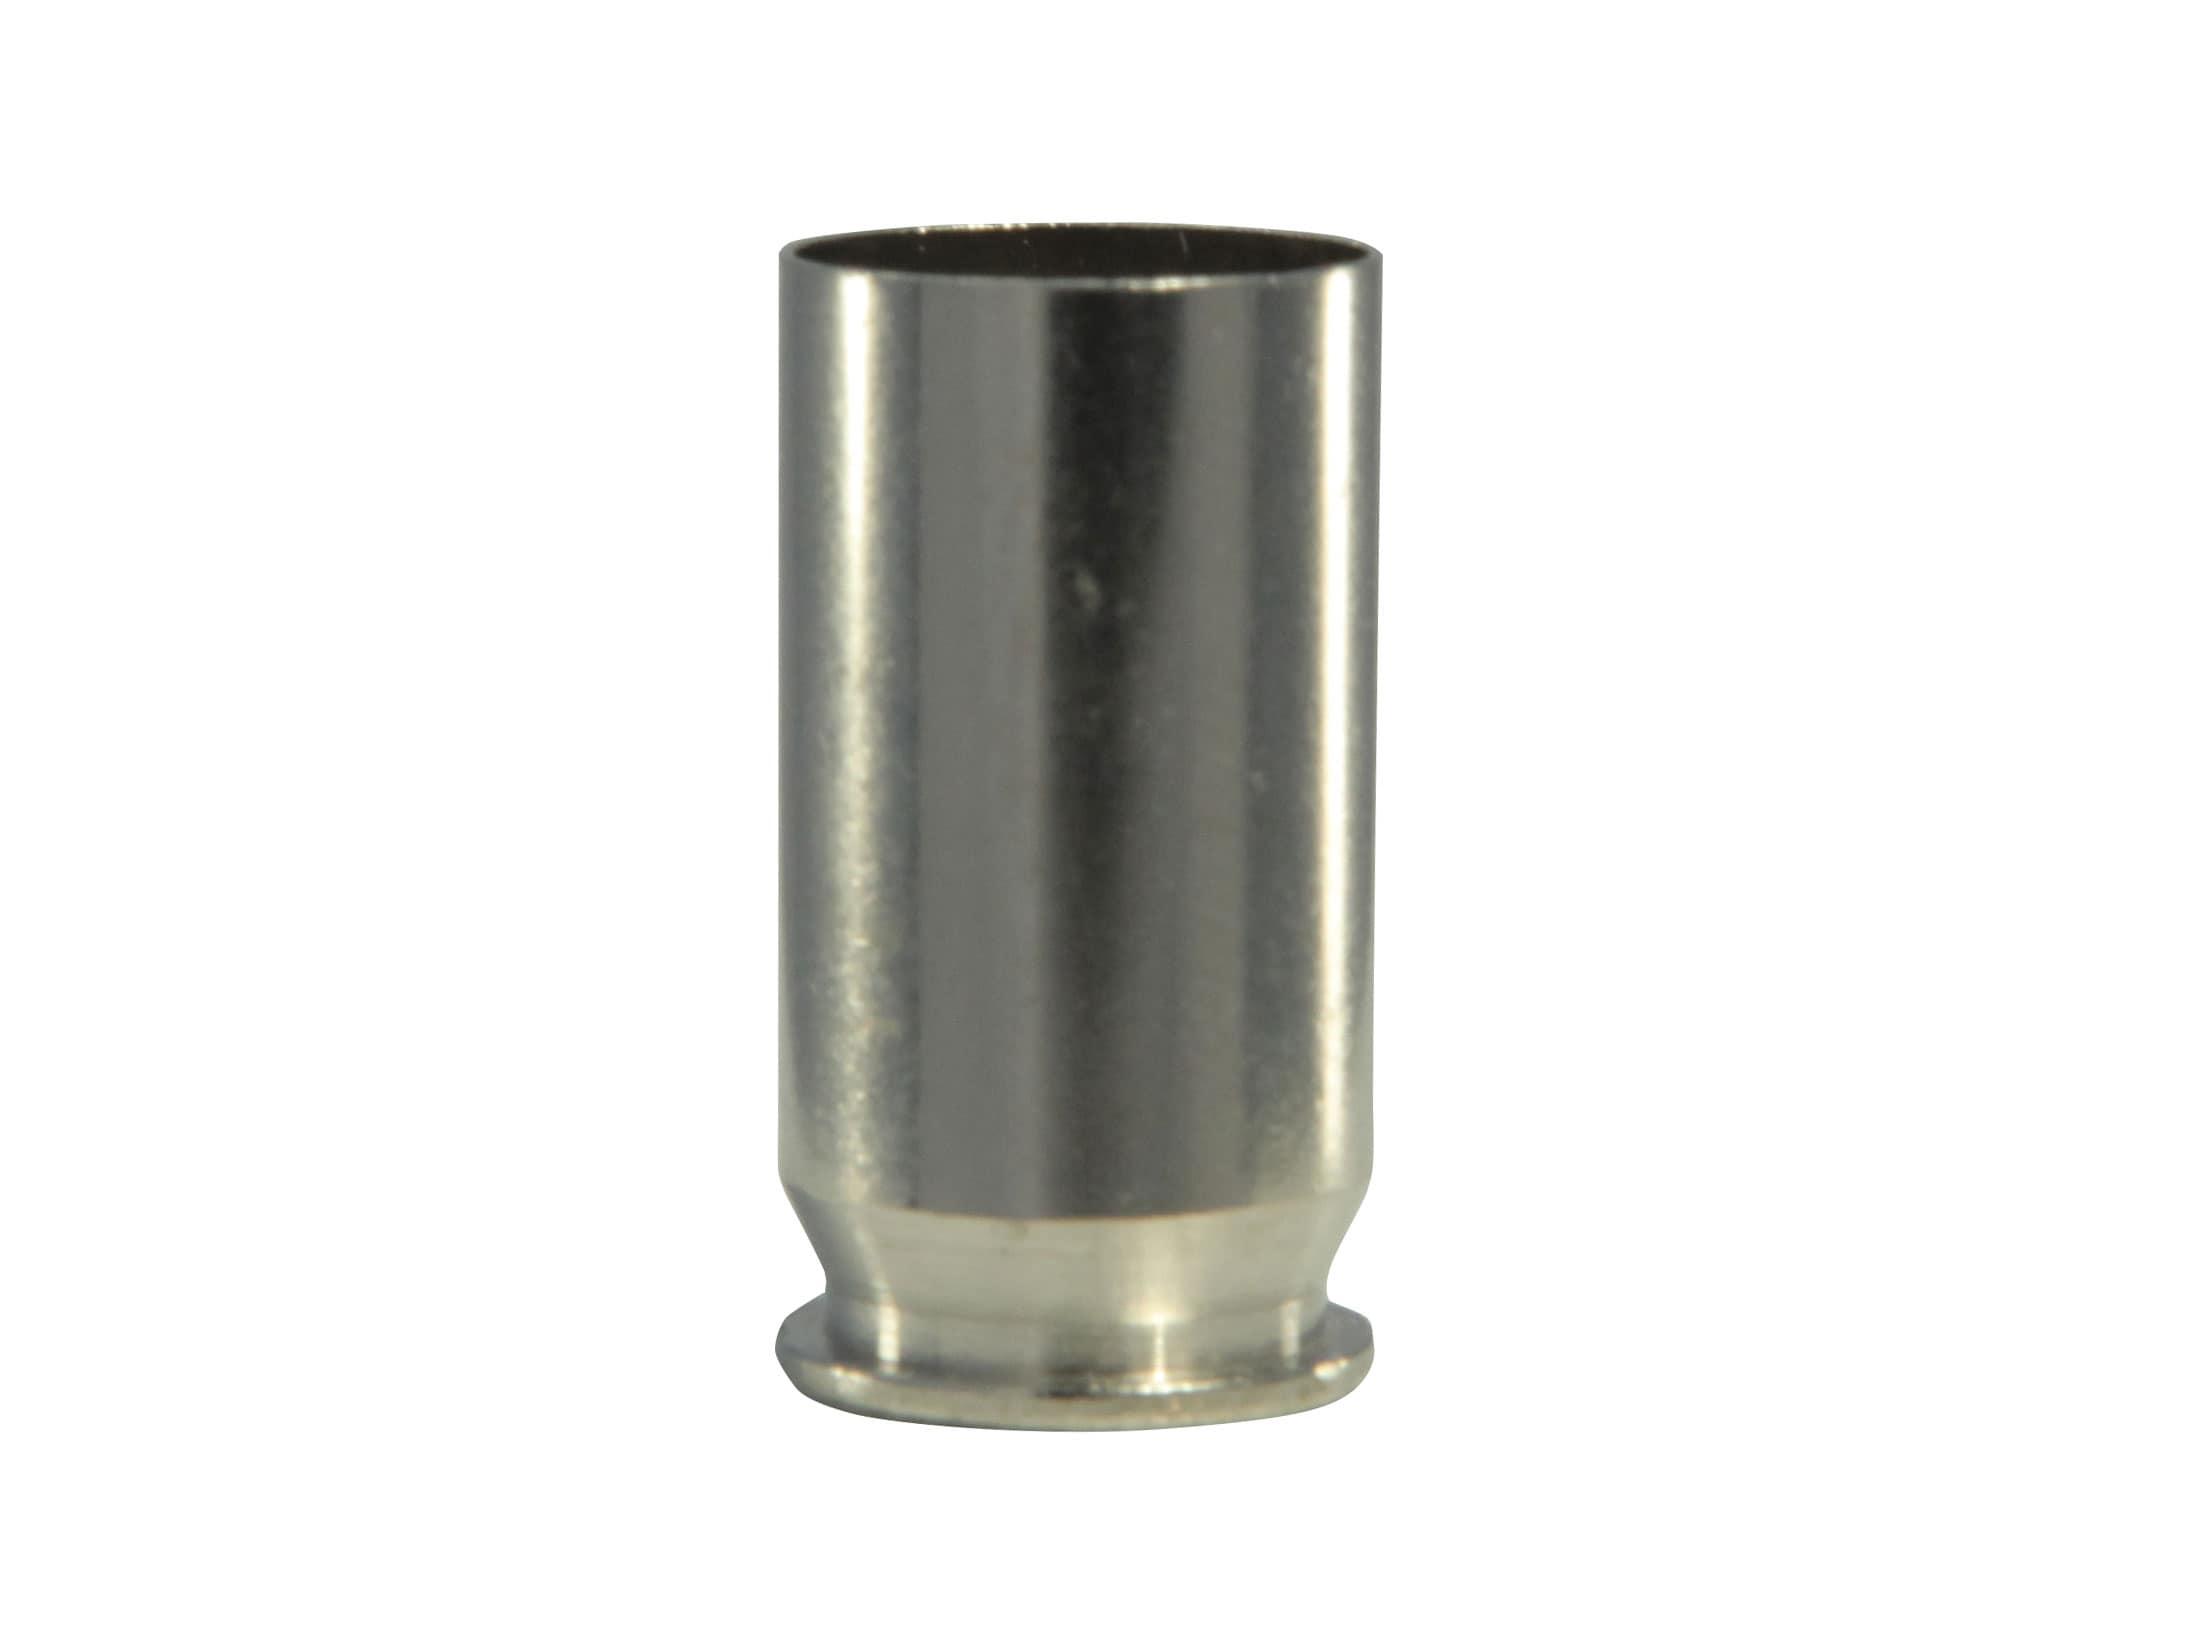 Remington Brass 45 ACP +P Nickel Plated Box of 100 (Bulk Packaged)